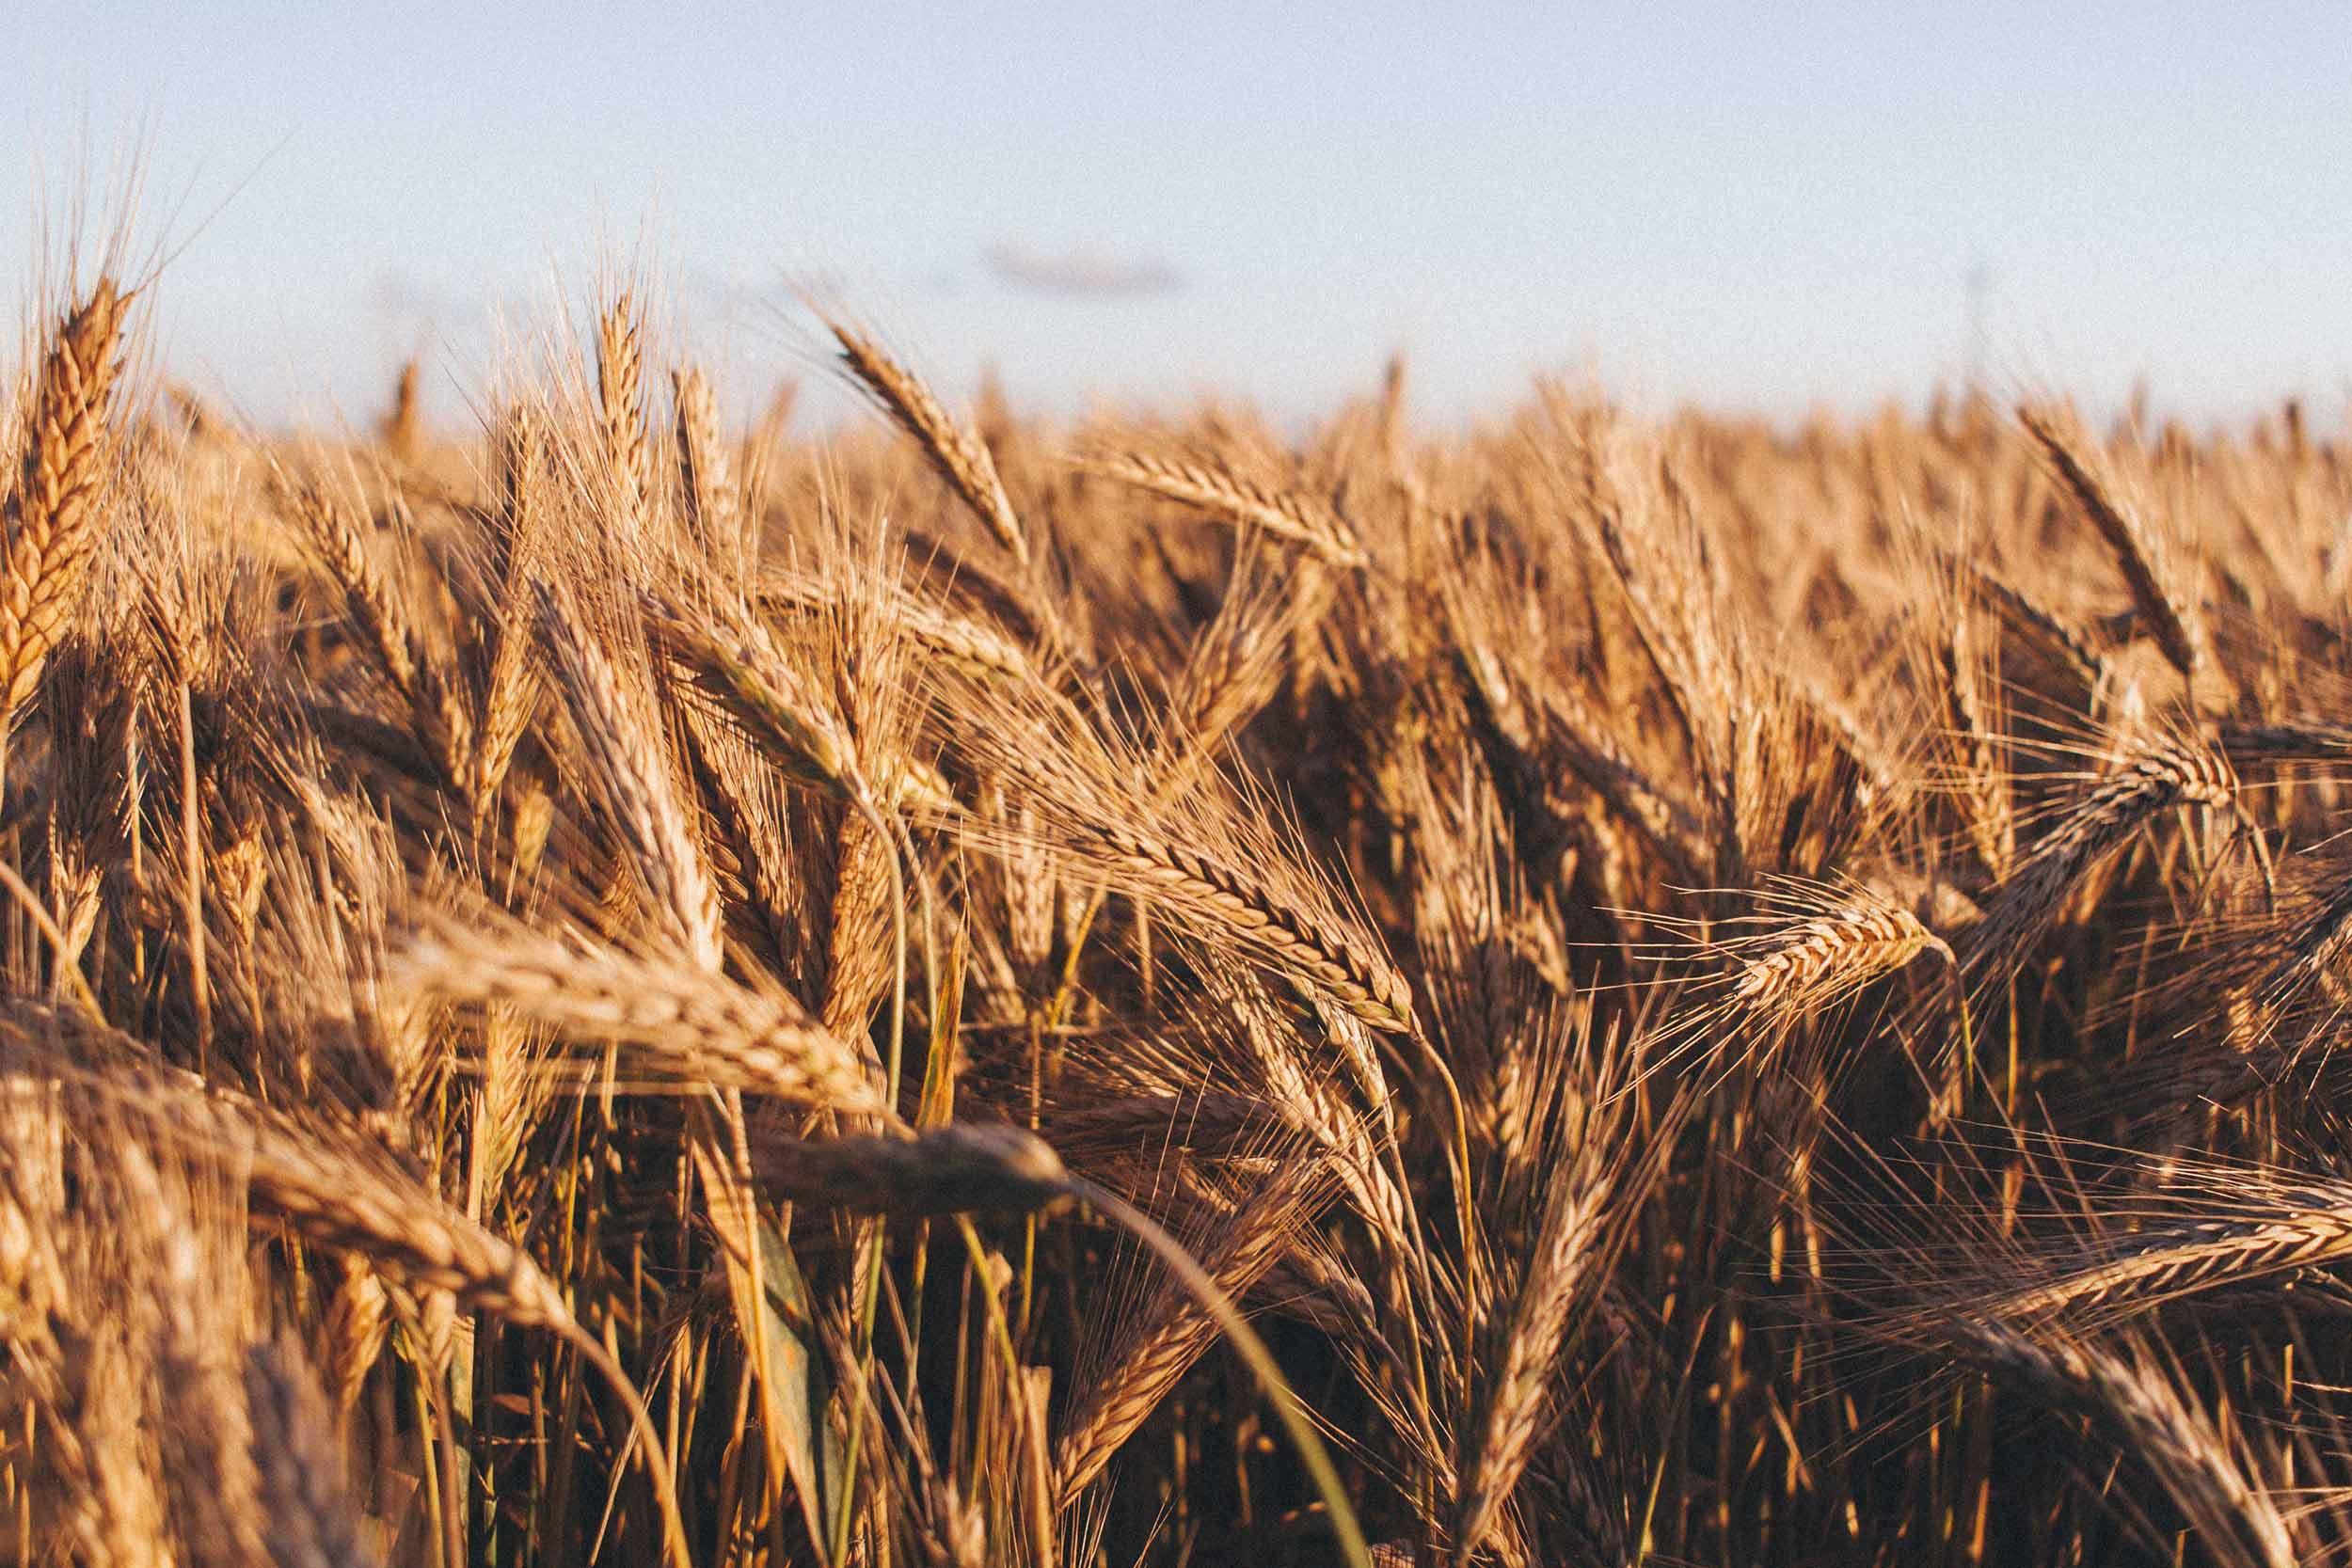 harvest festival crops